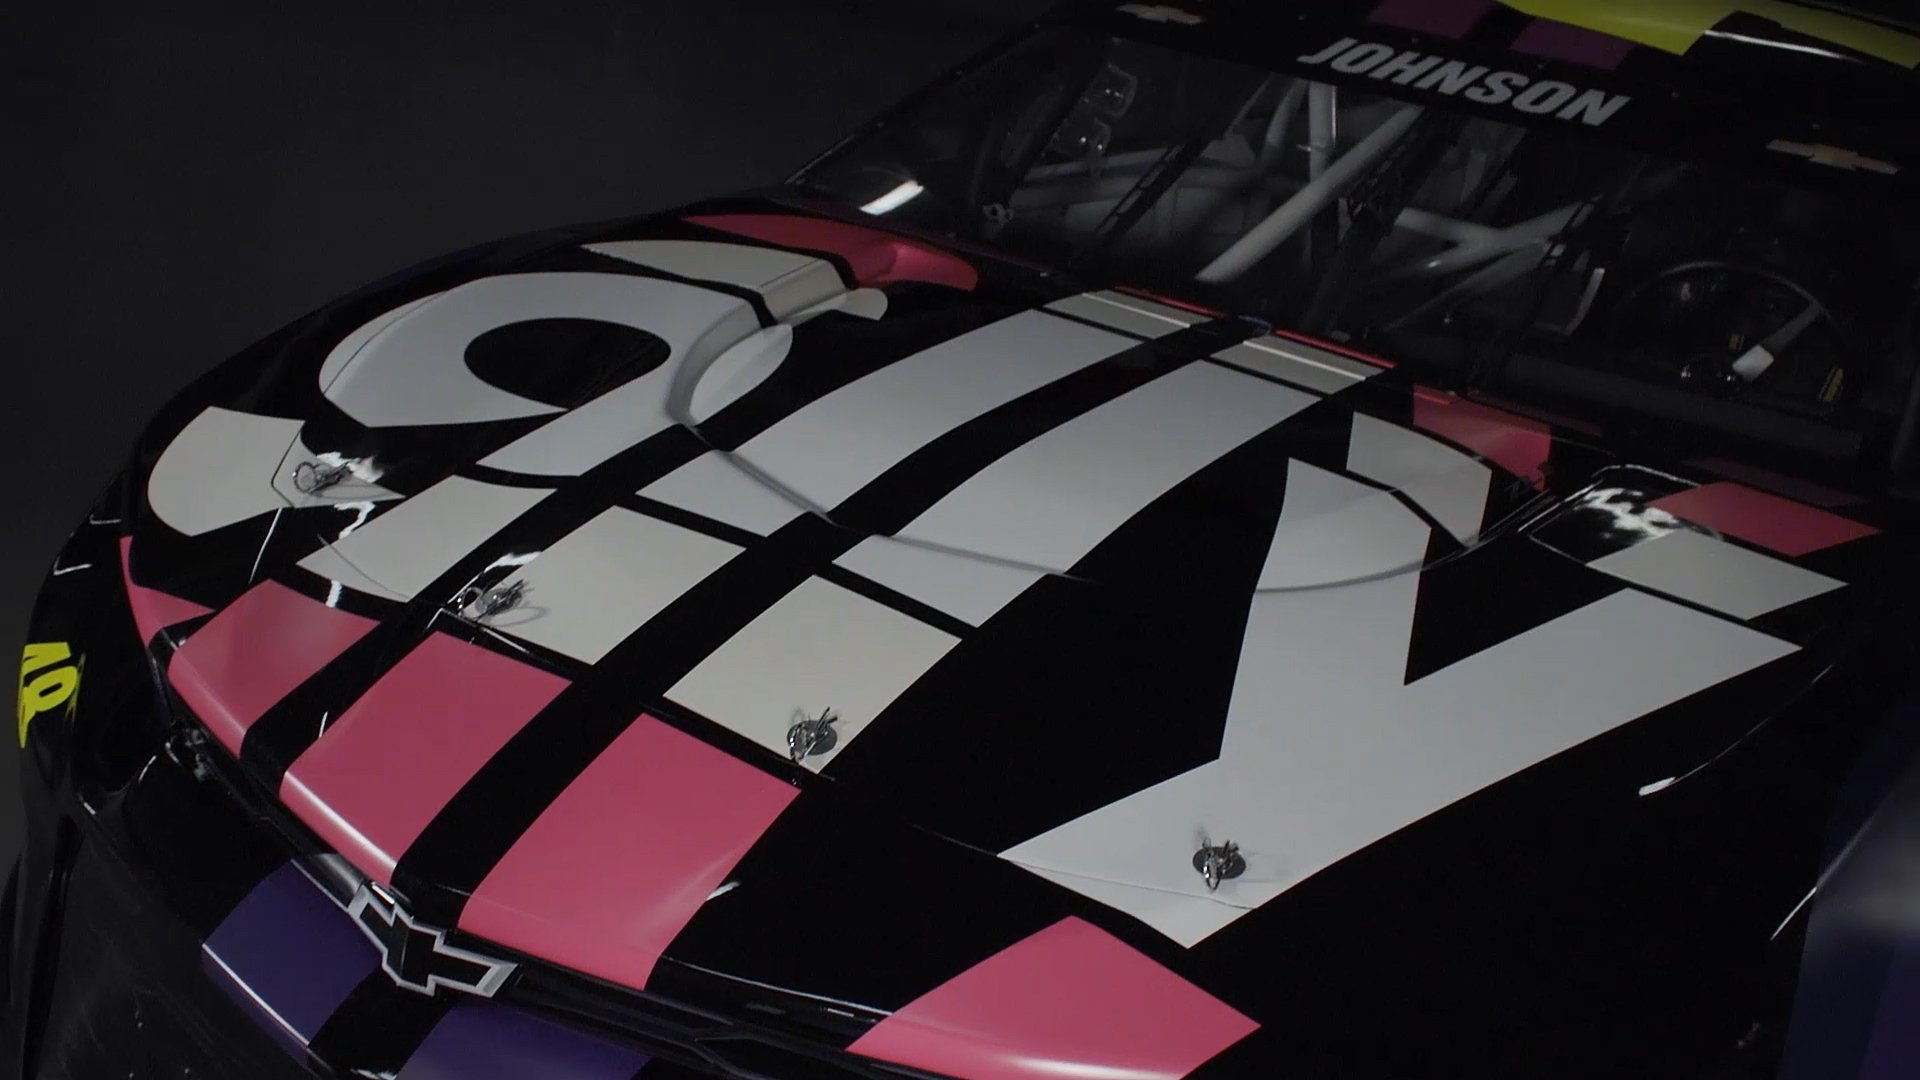 Nascar Racing Games >> Jimmie Johnson - 2019 Paint Scheme: Ally Financial (Video) - Racing News